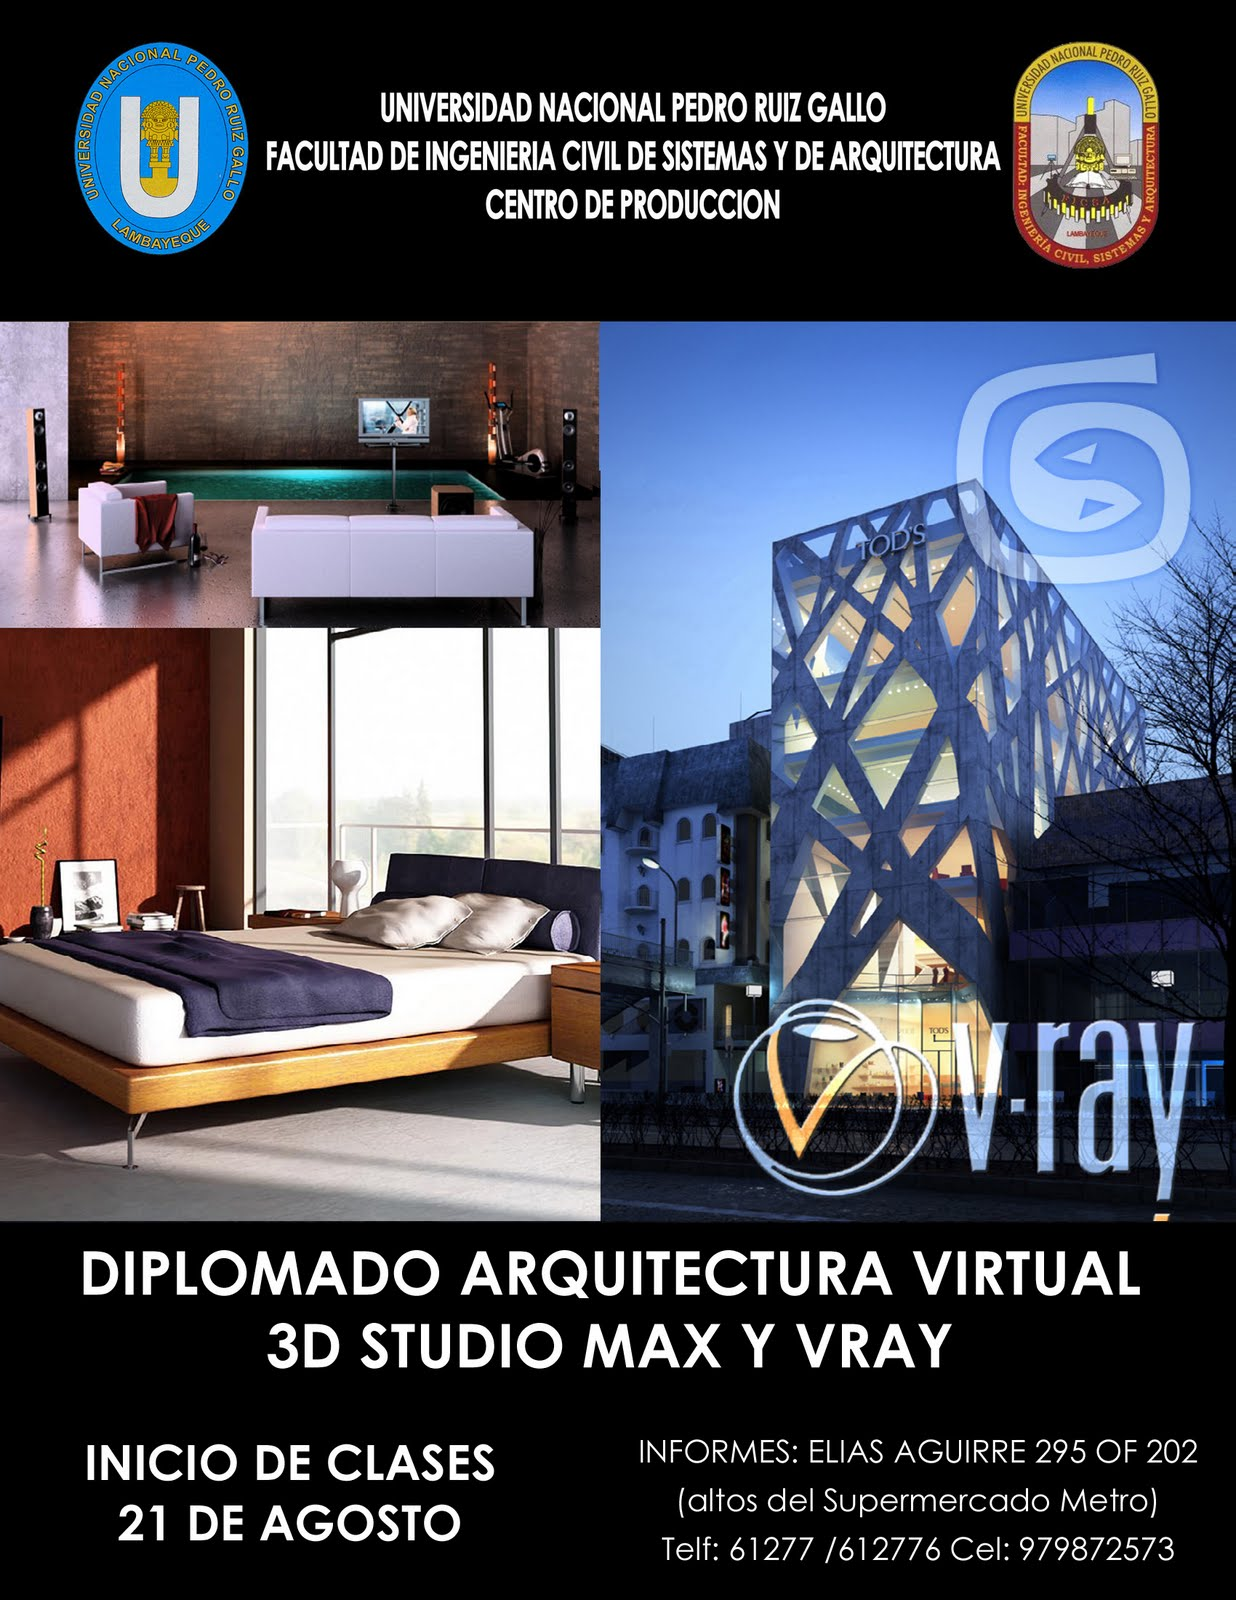 Martin ramirez 3d arquitectura virtual for Arquitectura virtual